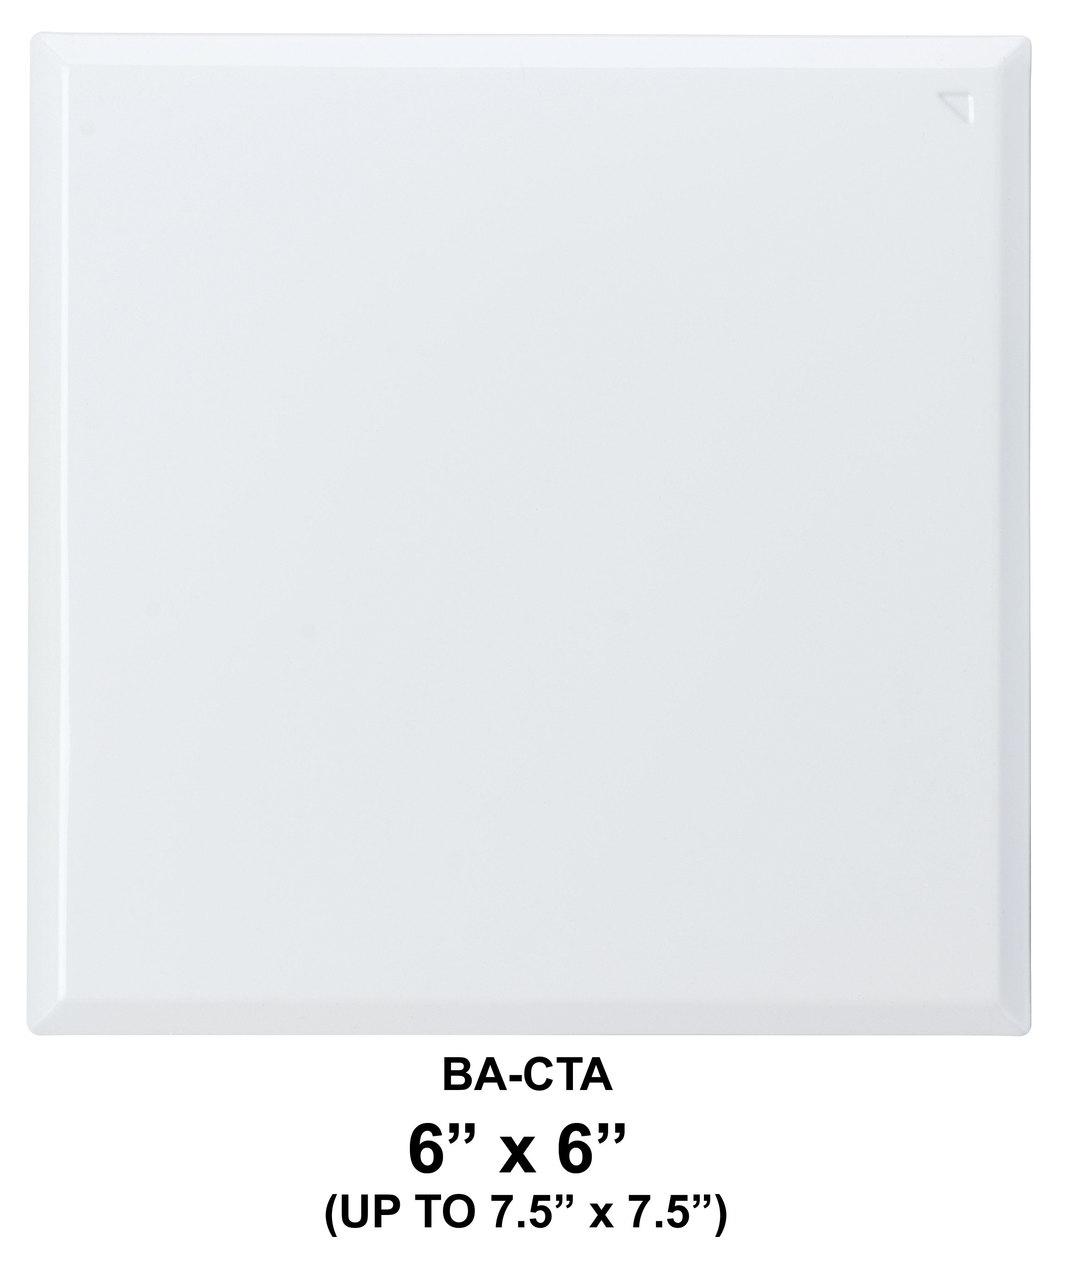 Access Panels BA-CTA 6 x 6 Removeable / Adjustable Access Door - BEST